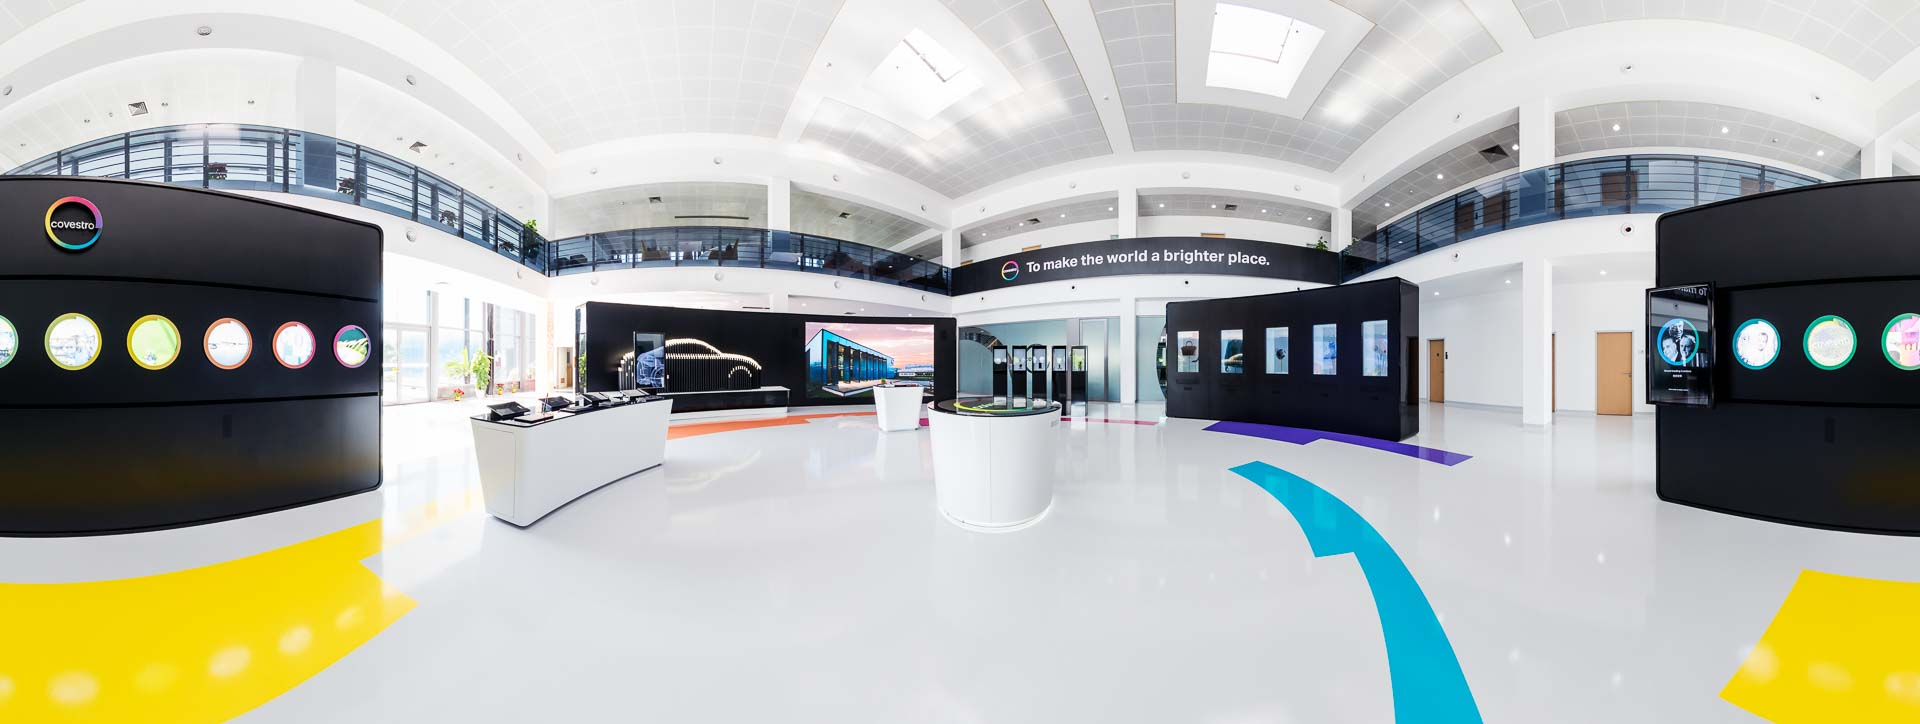 Showroom Unternehmen Corporate – 360° Foto